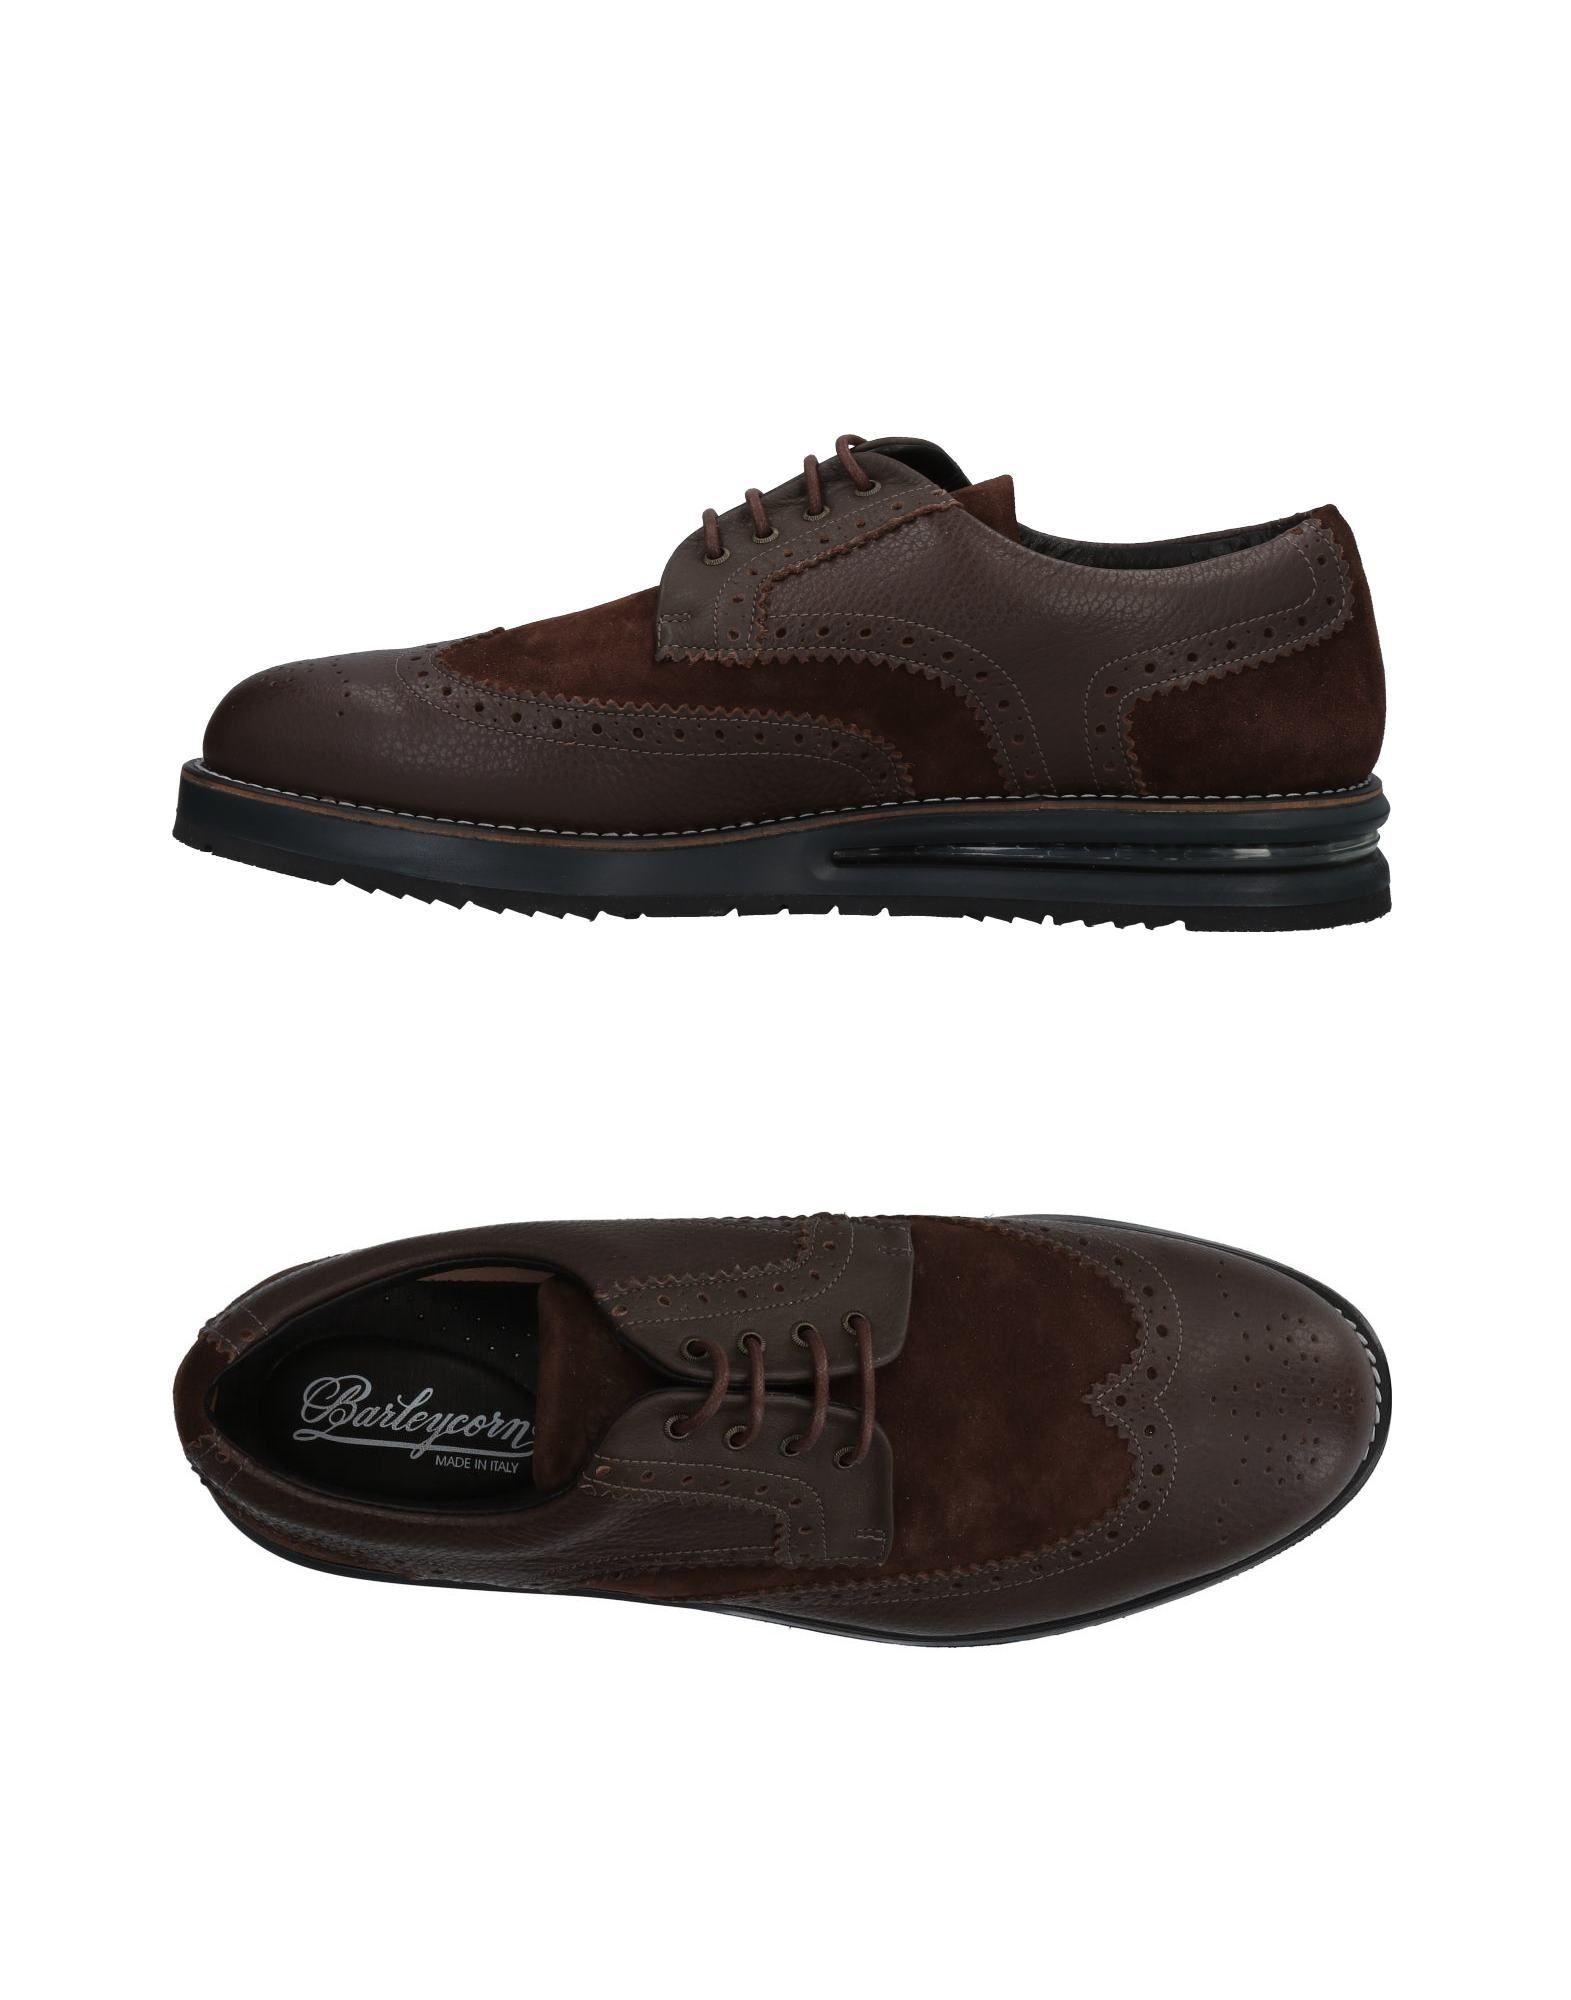 Фото - BARLEYCORN Обувь на шнурках обувь на высокой платформе dkny